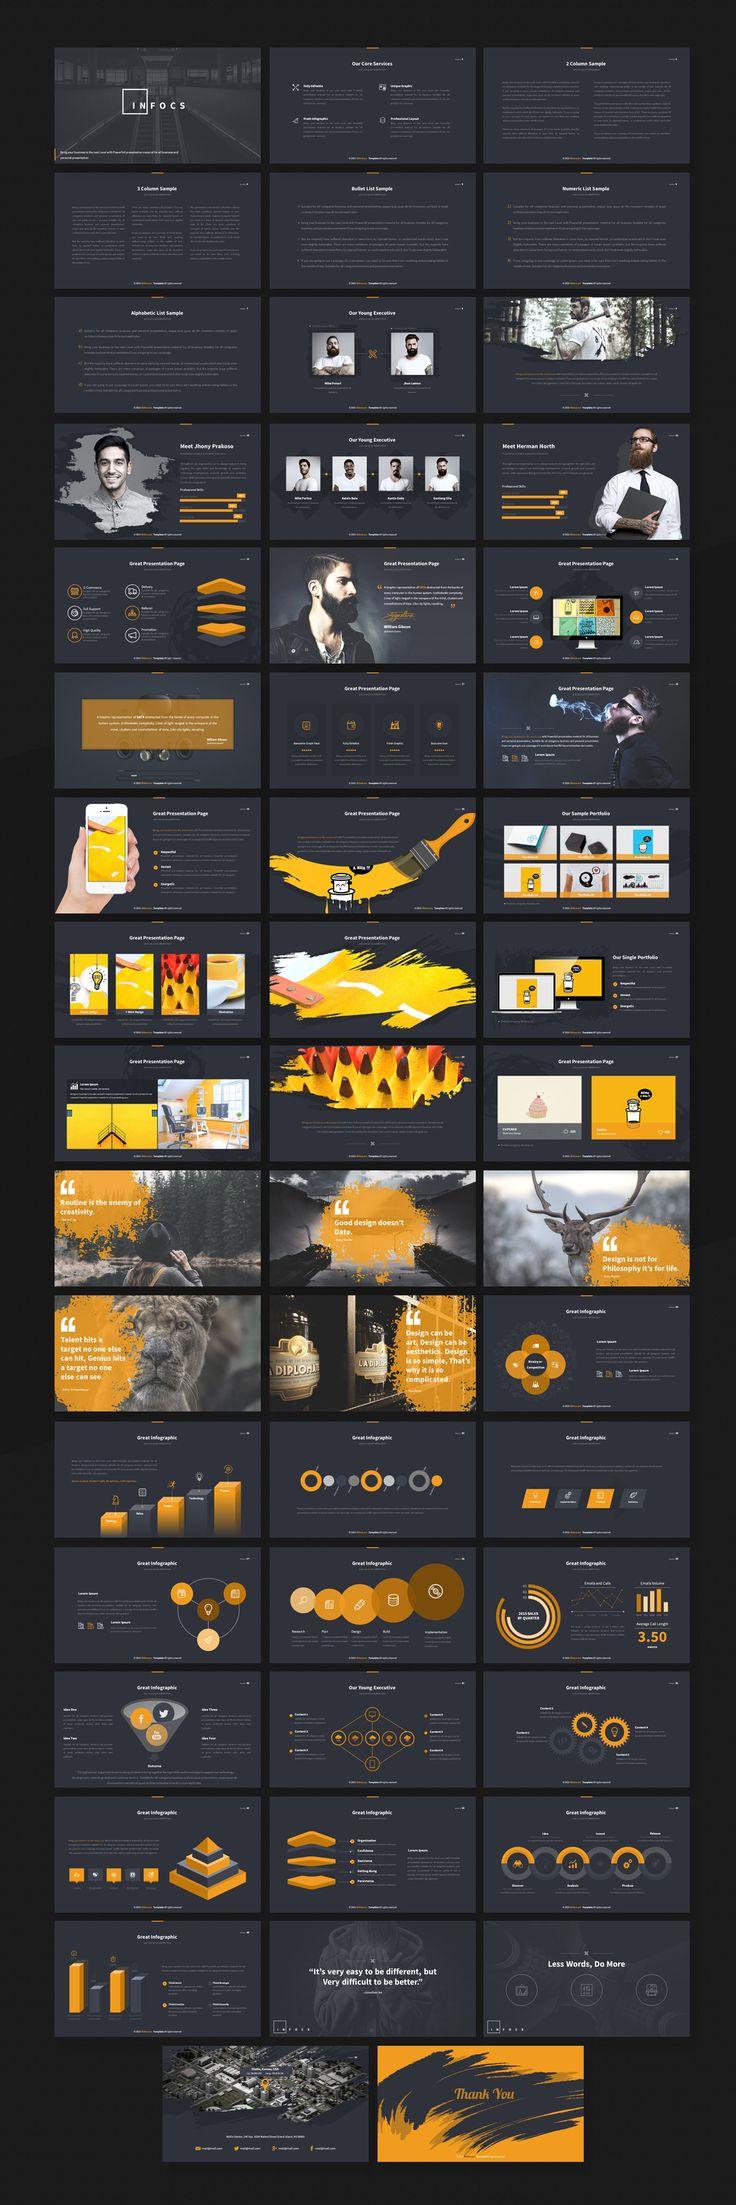 Infocs - Multipurpose Presentation by SlideMore on @creativemarket